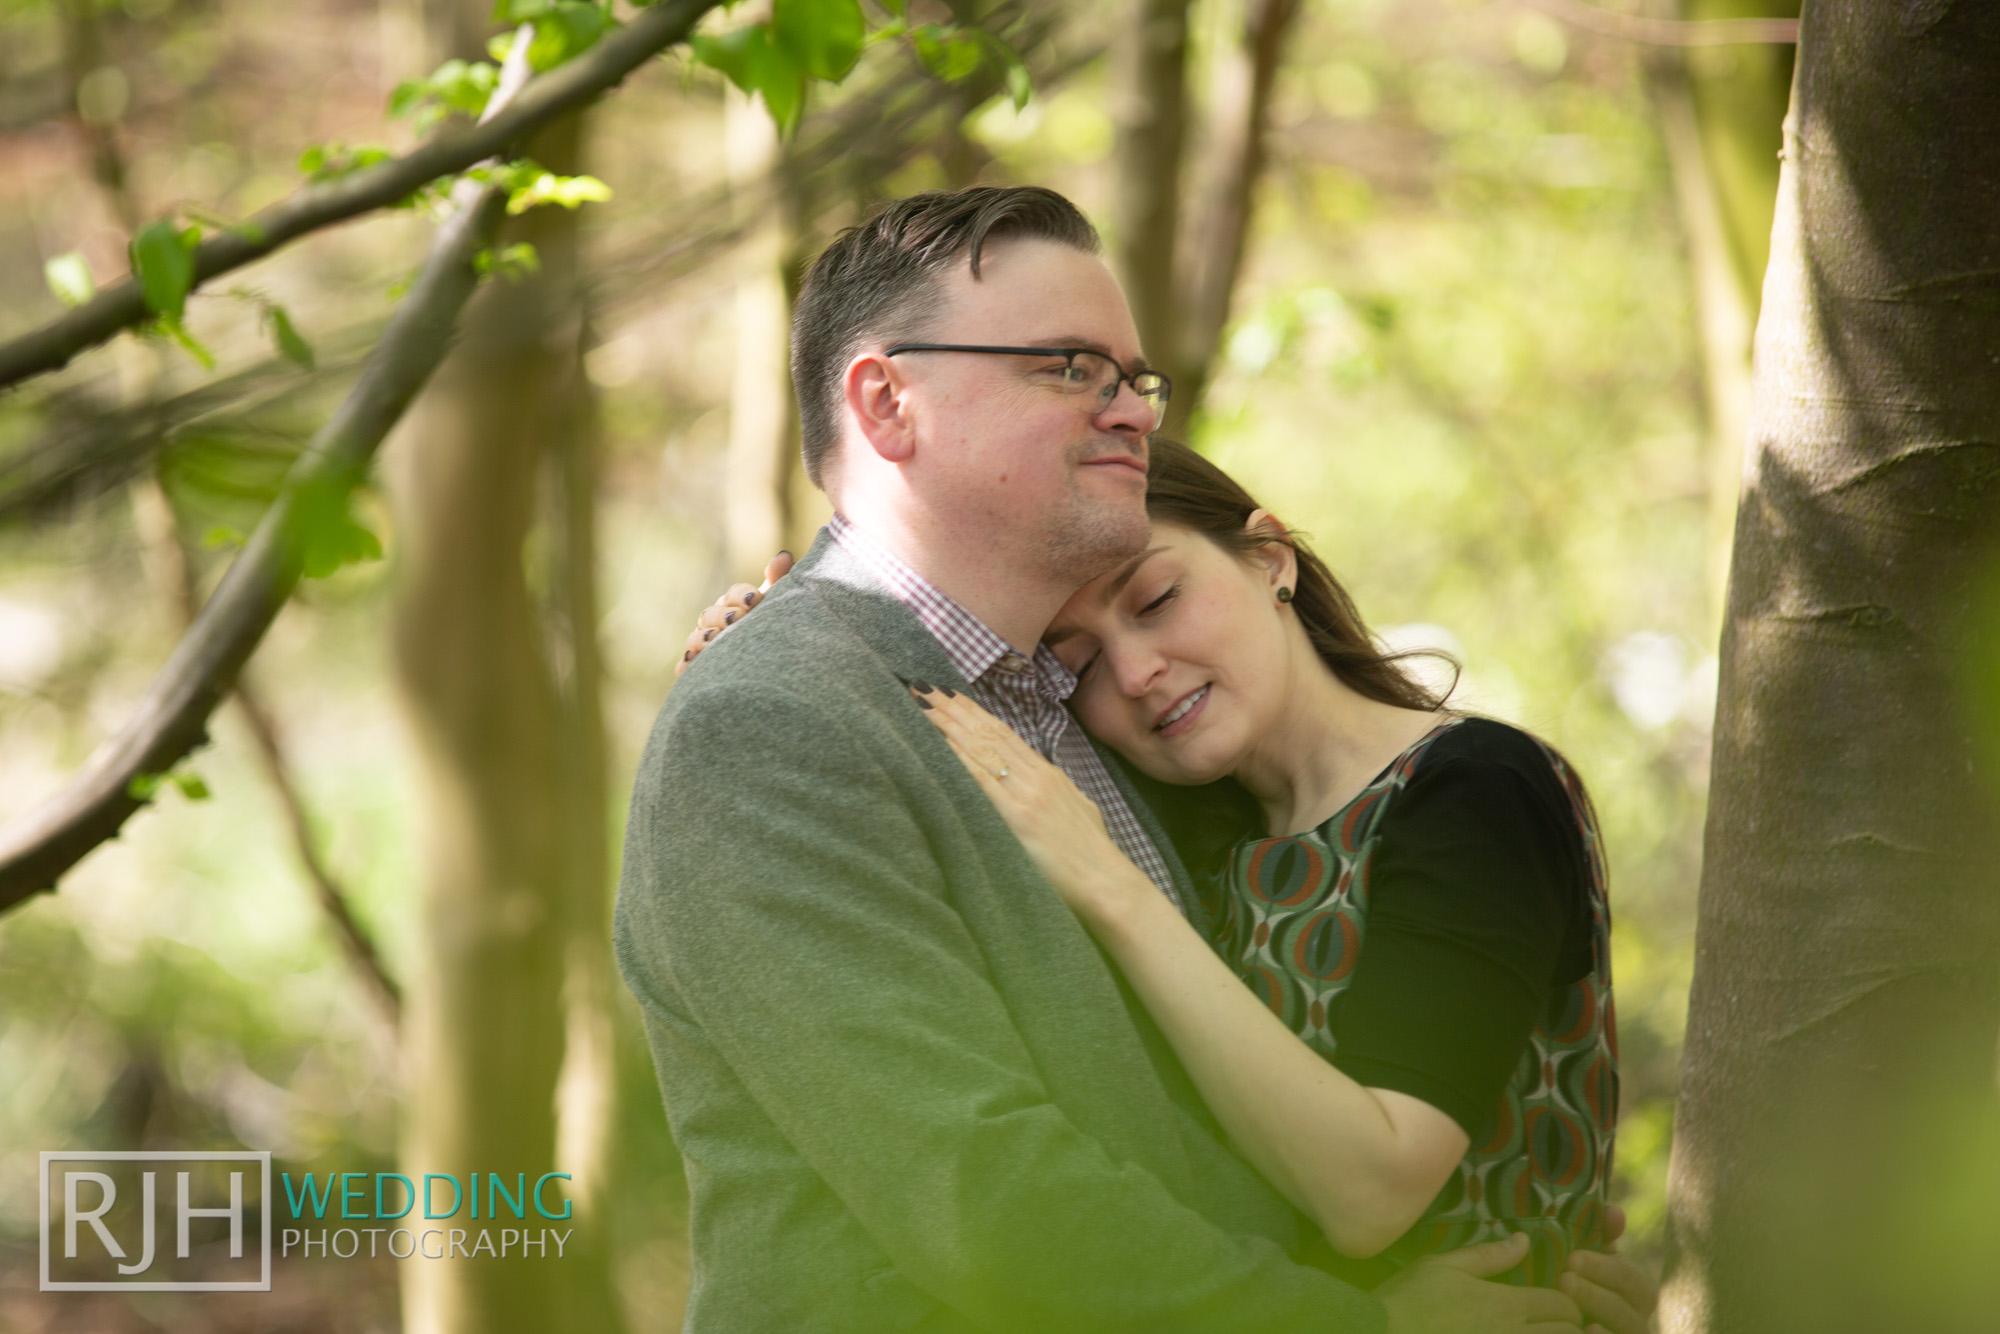 Pre-wedding photography - Richard & Rachel_008_3C2A8155.jpg